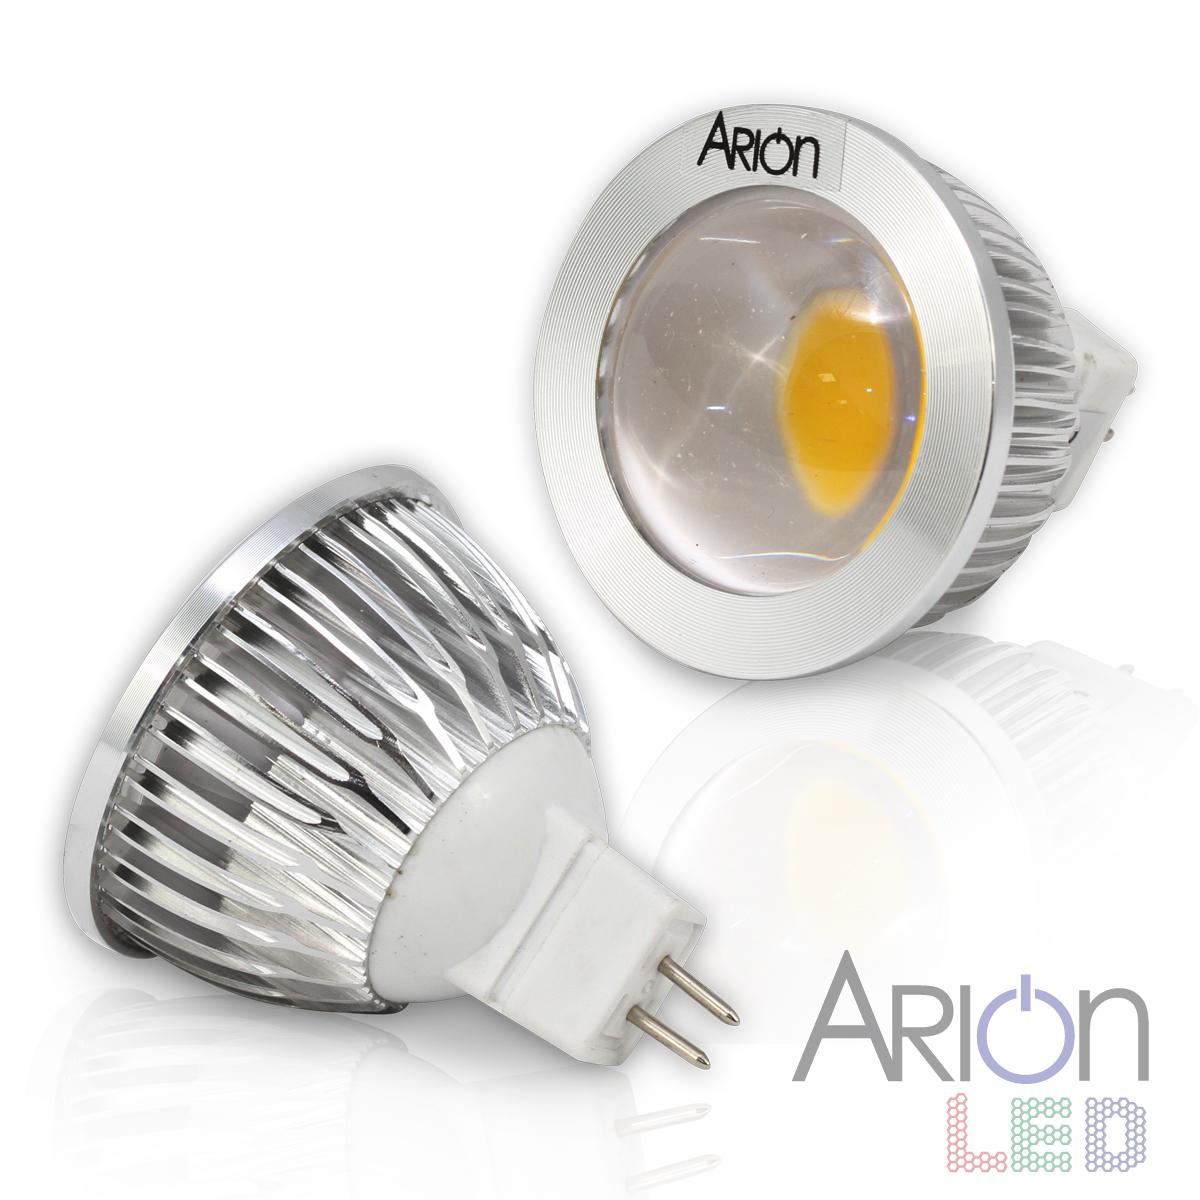 3w Cob Led Spot Light Bulb 12v For External Driver Mr Bulb Lamp